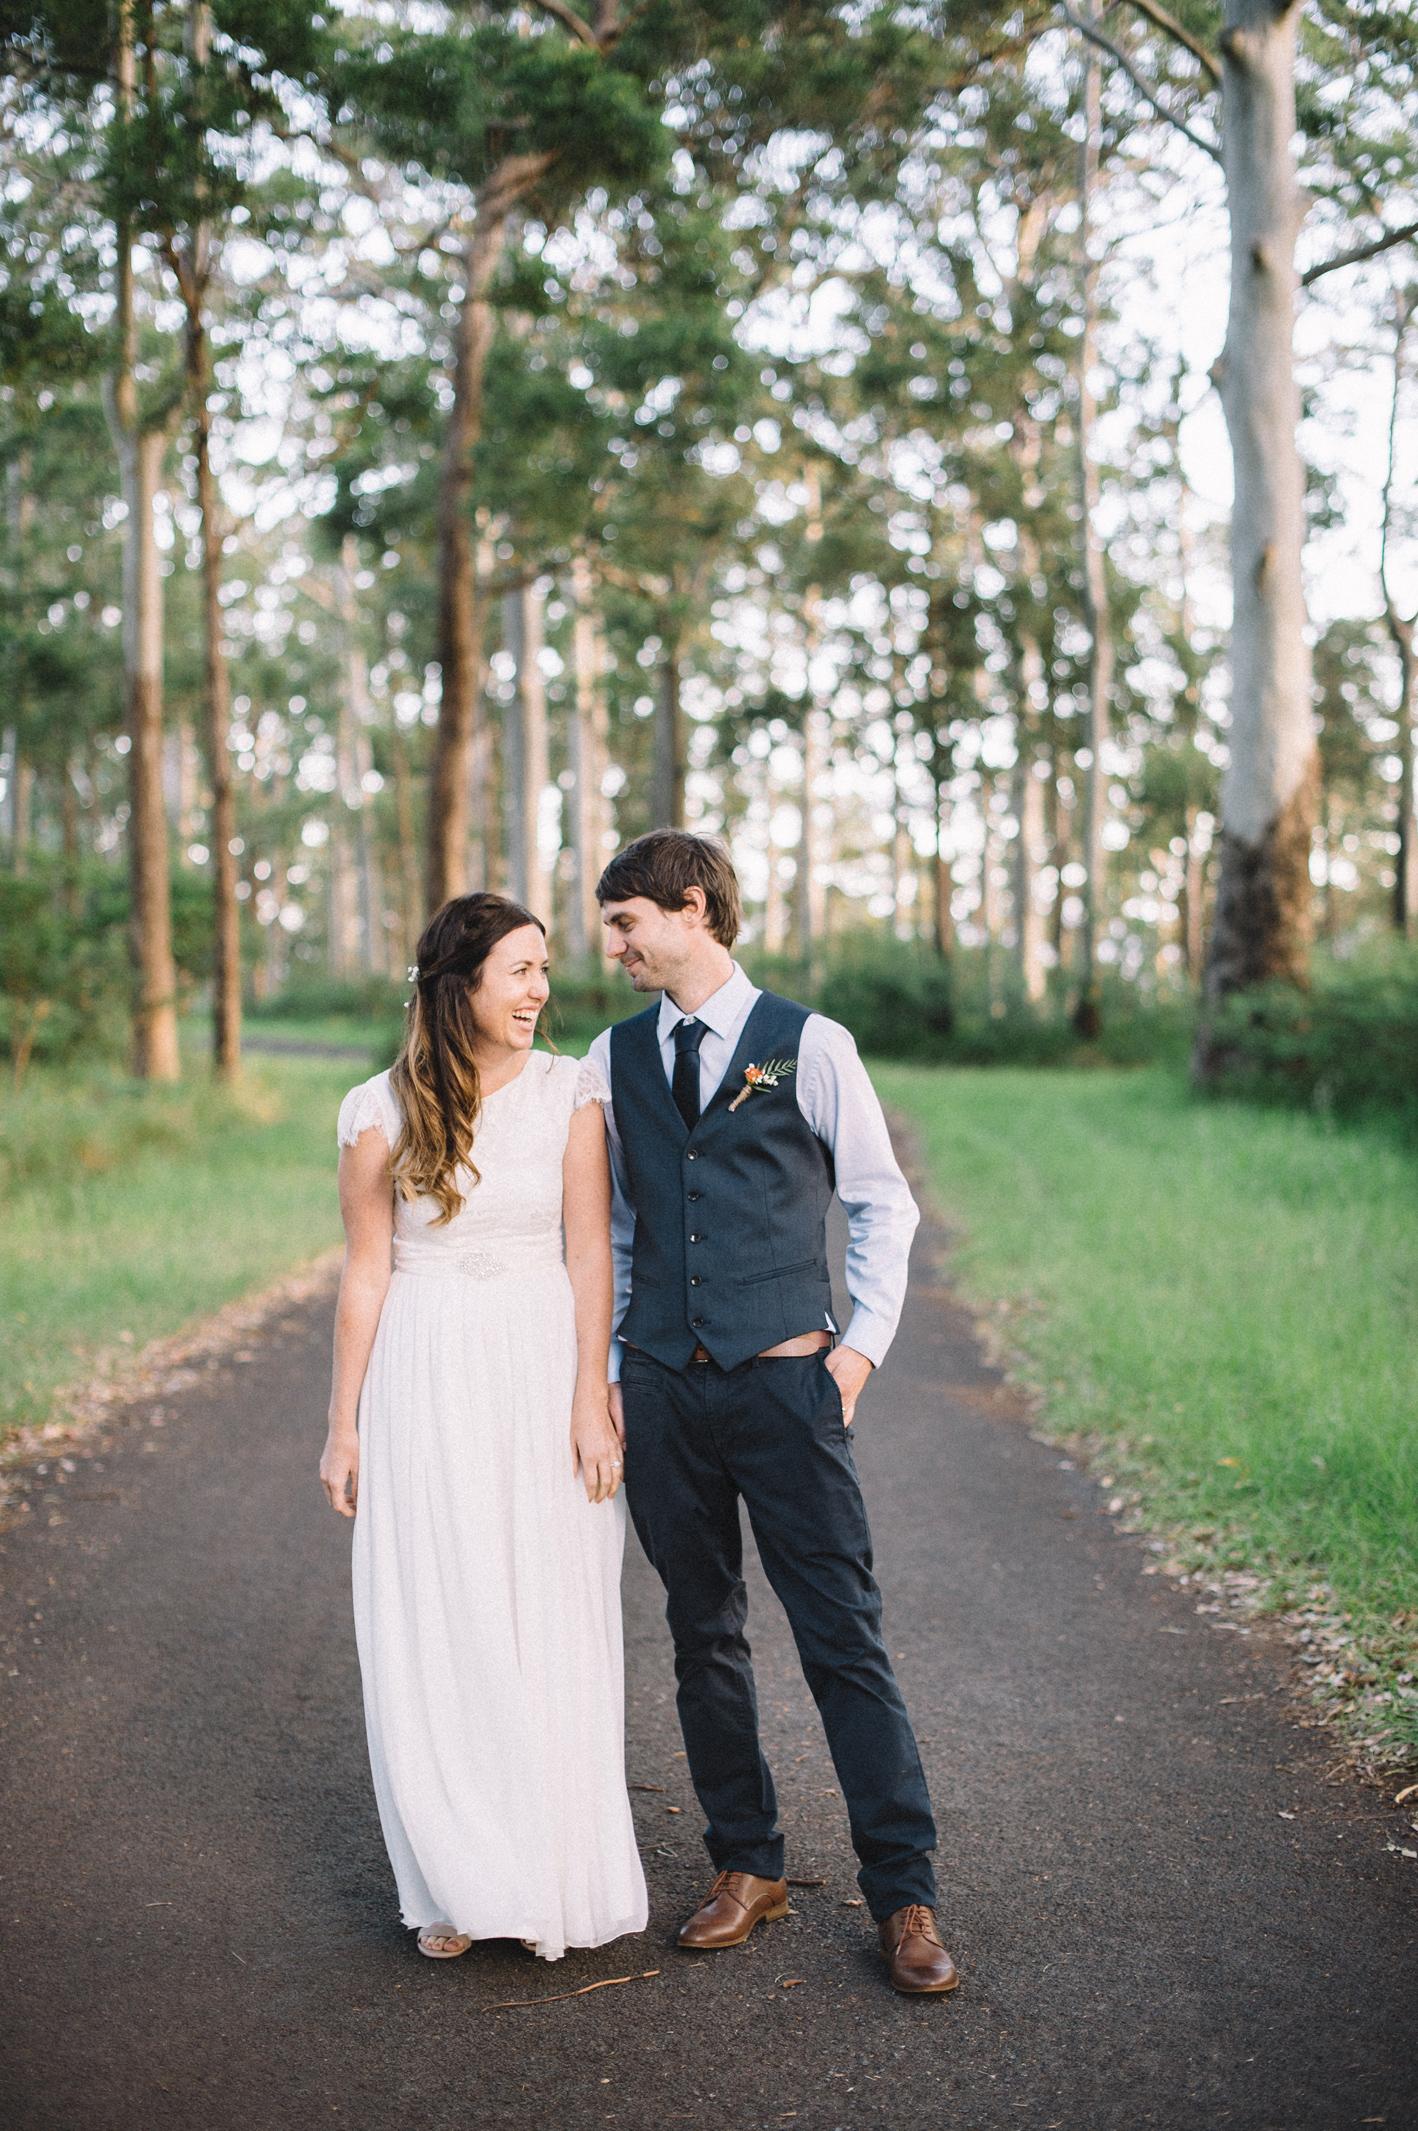 063-michelle-reagan-mount-tamborine-wedding-sophie-baker-photography